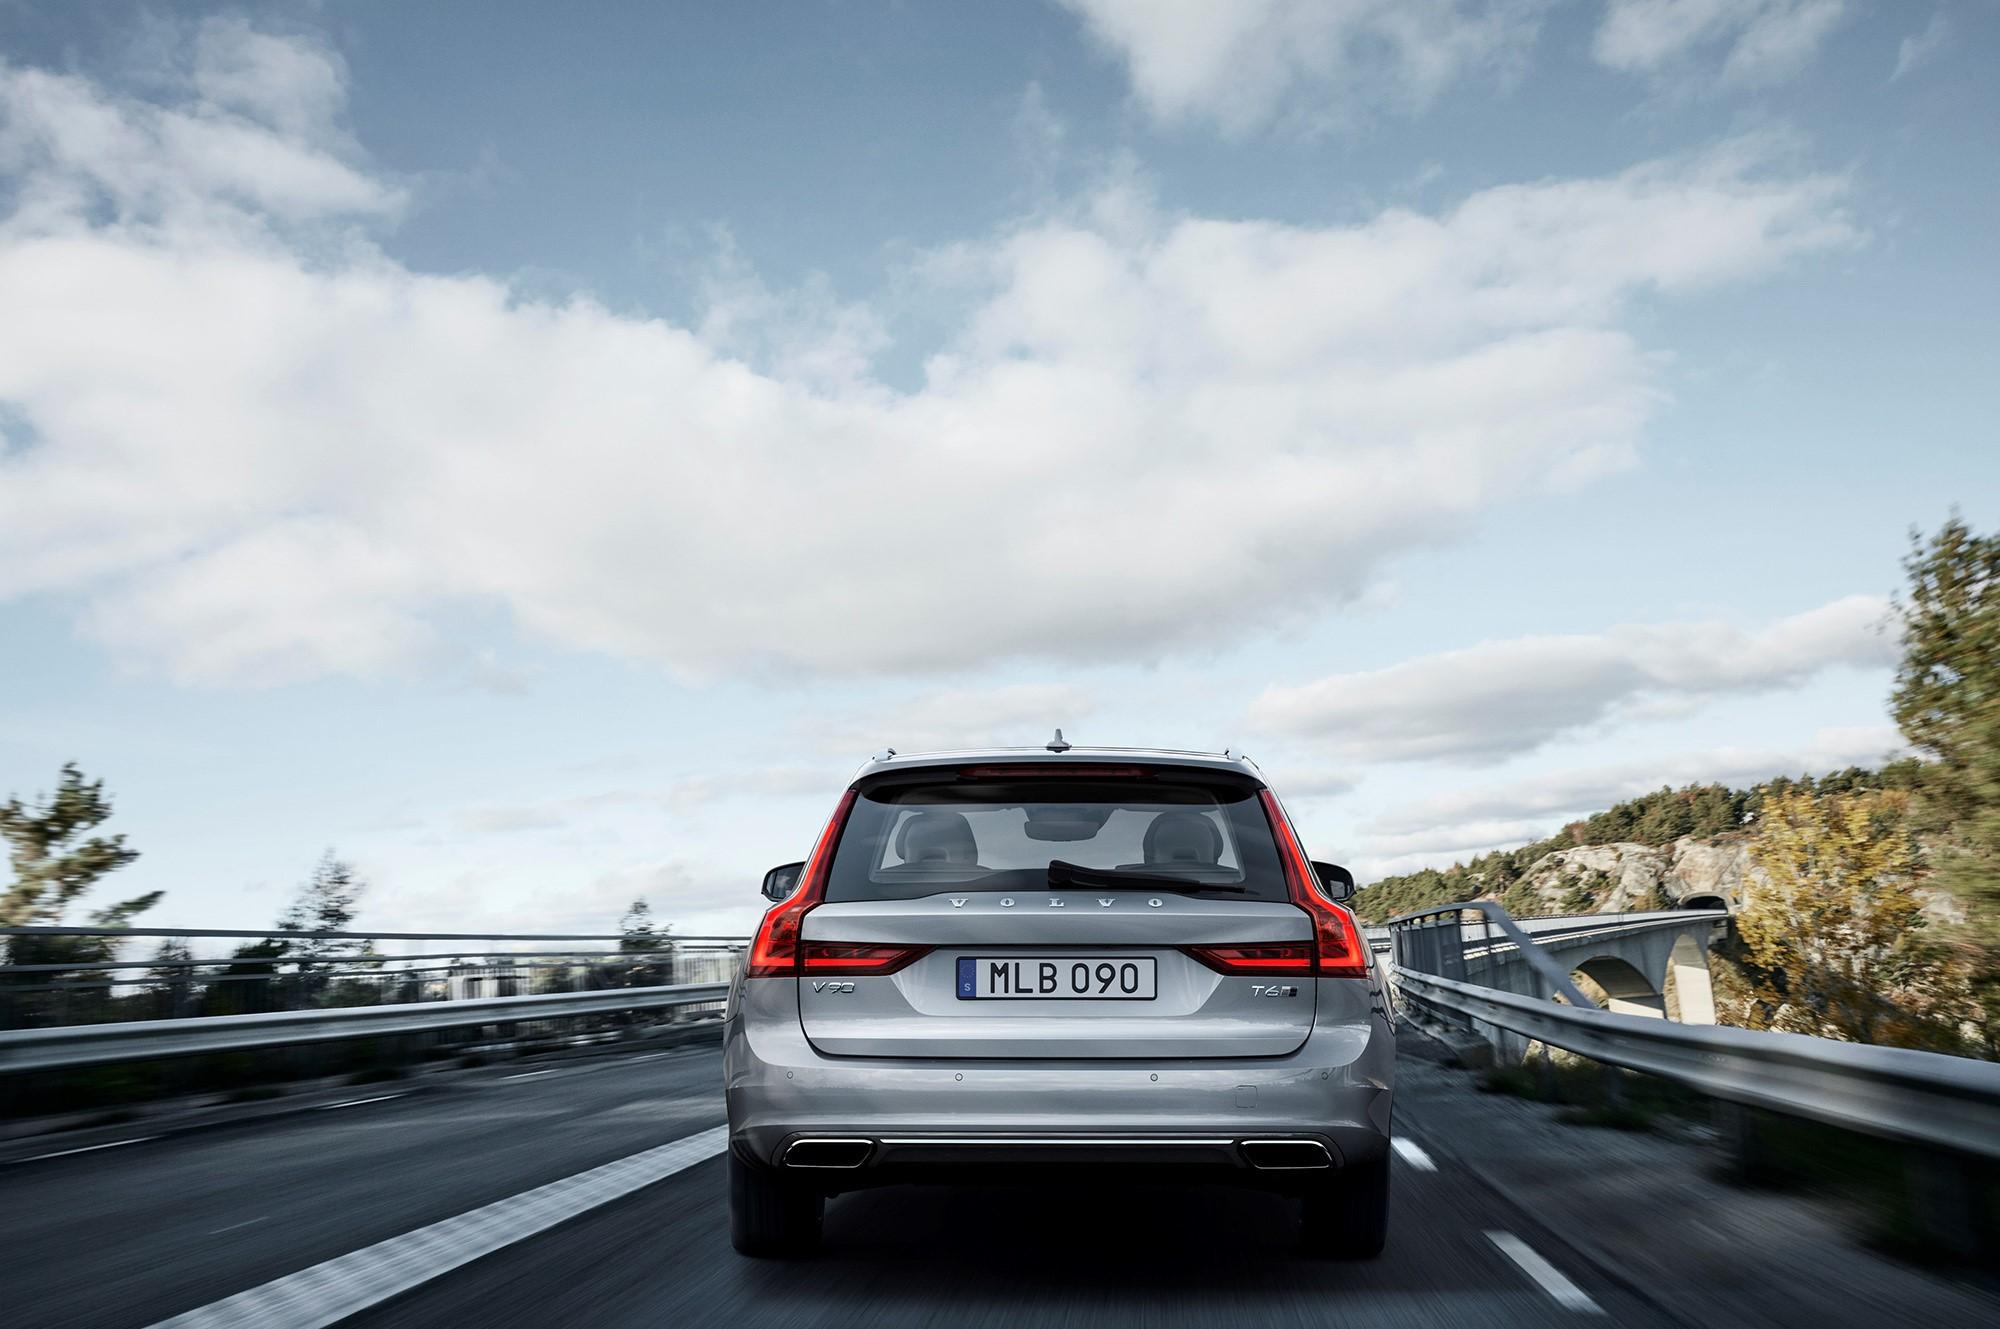 Volvo V90 Pics